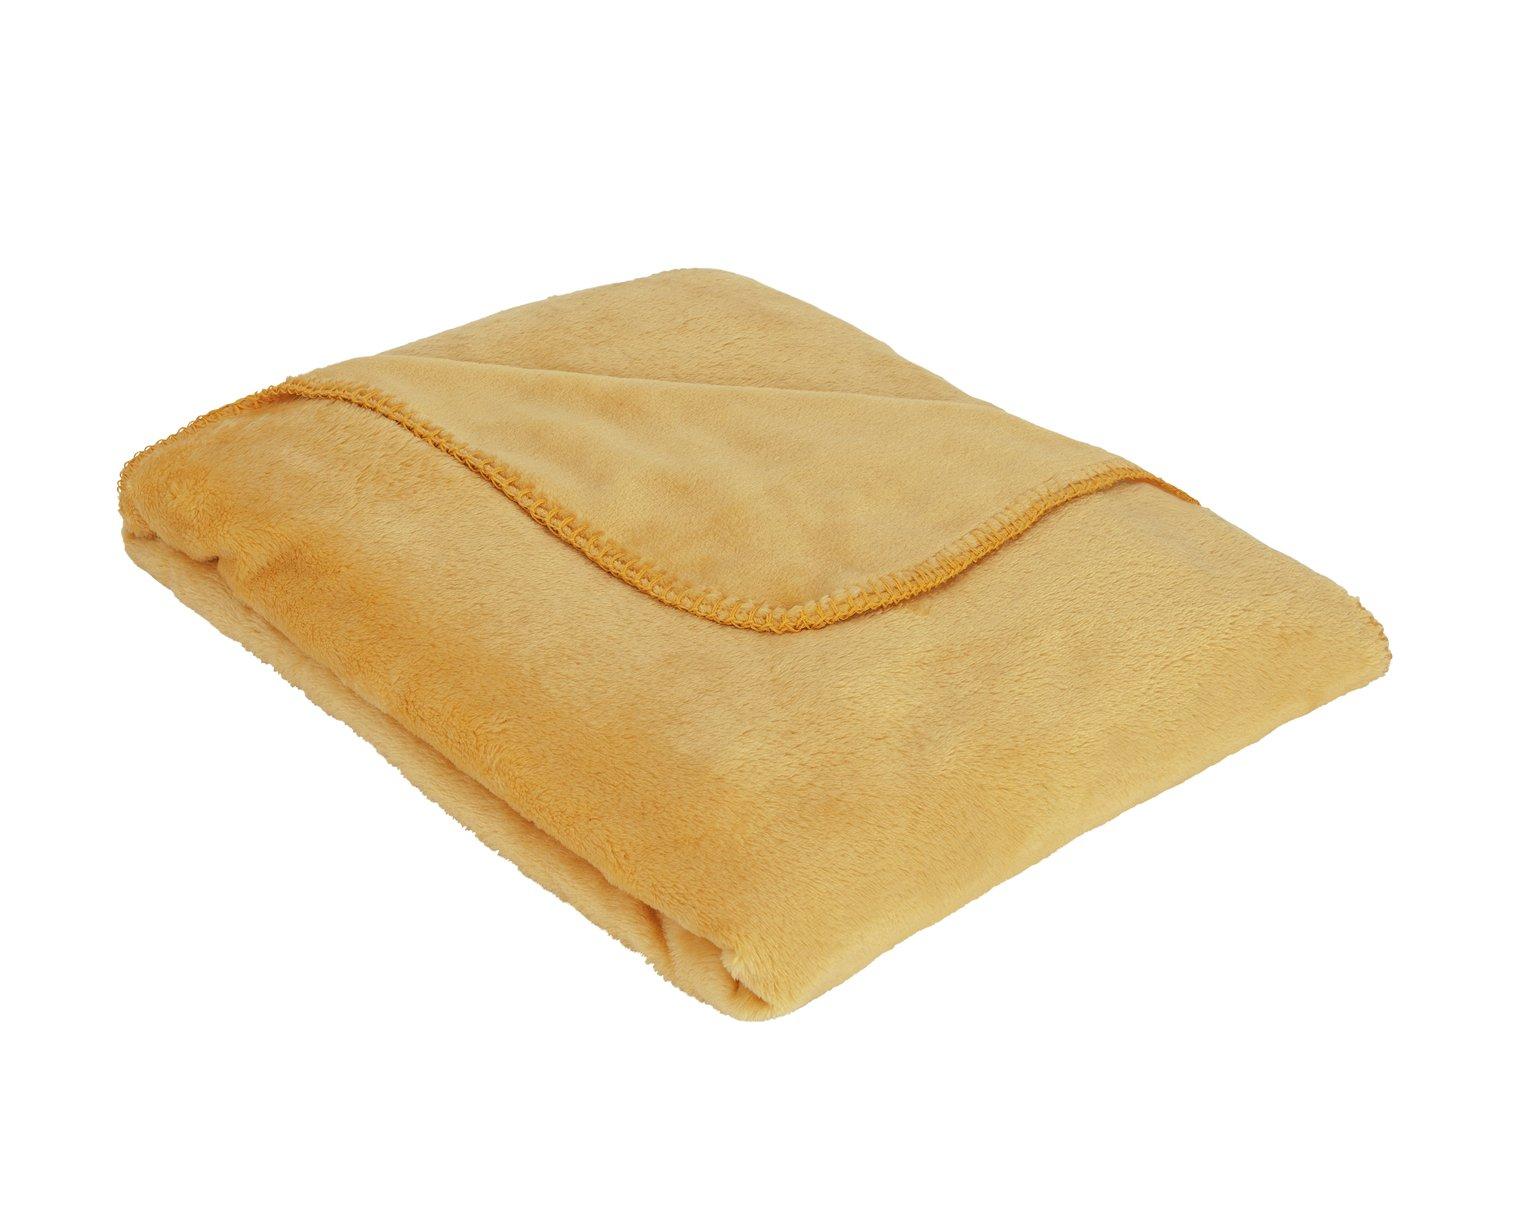 Argos Home Supersoft Fleece Throw - Mustard